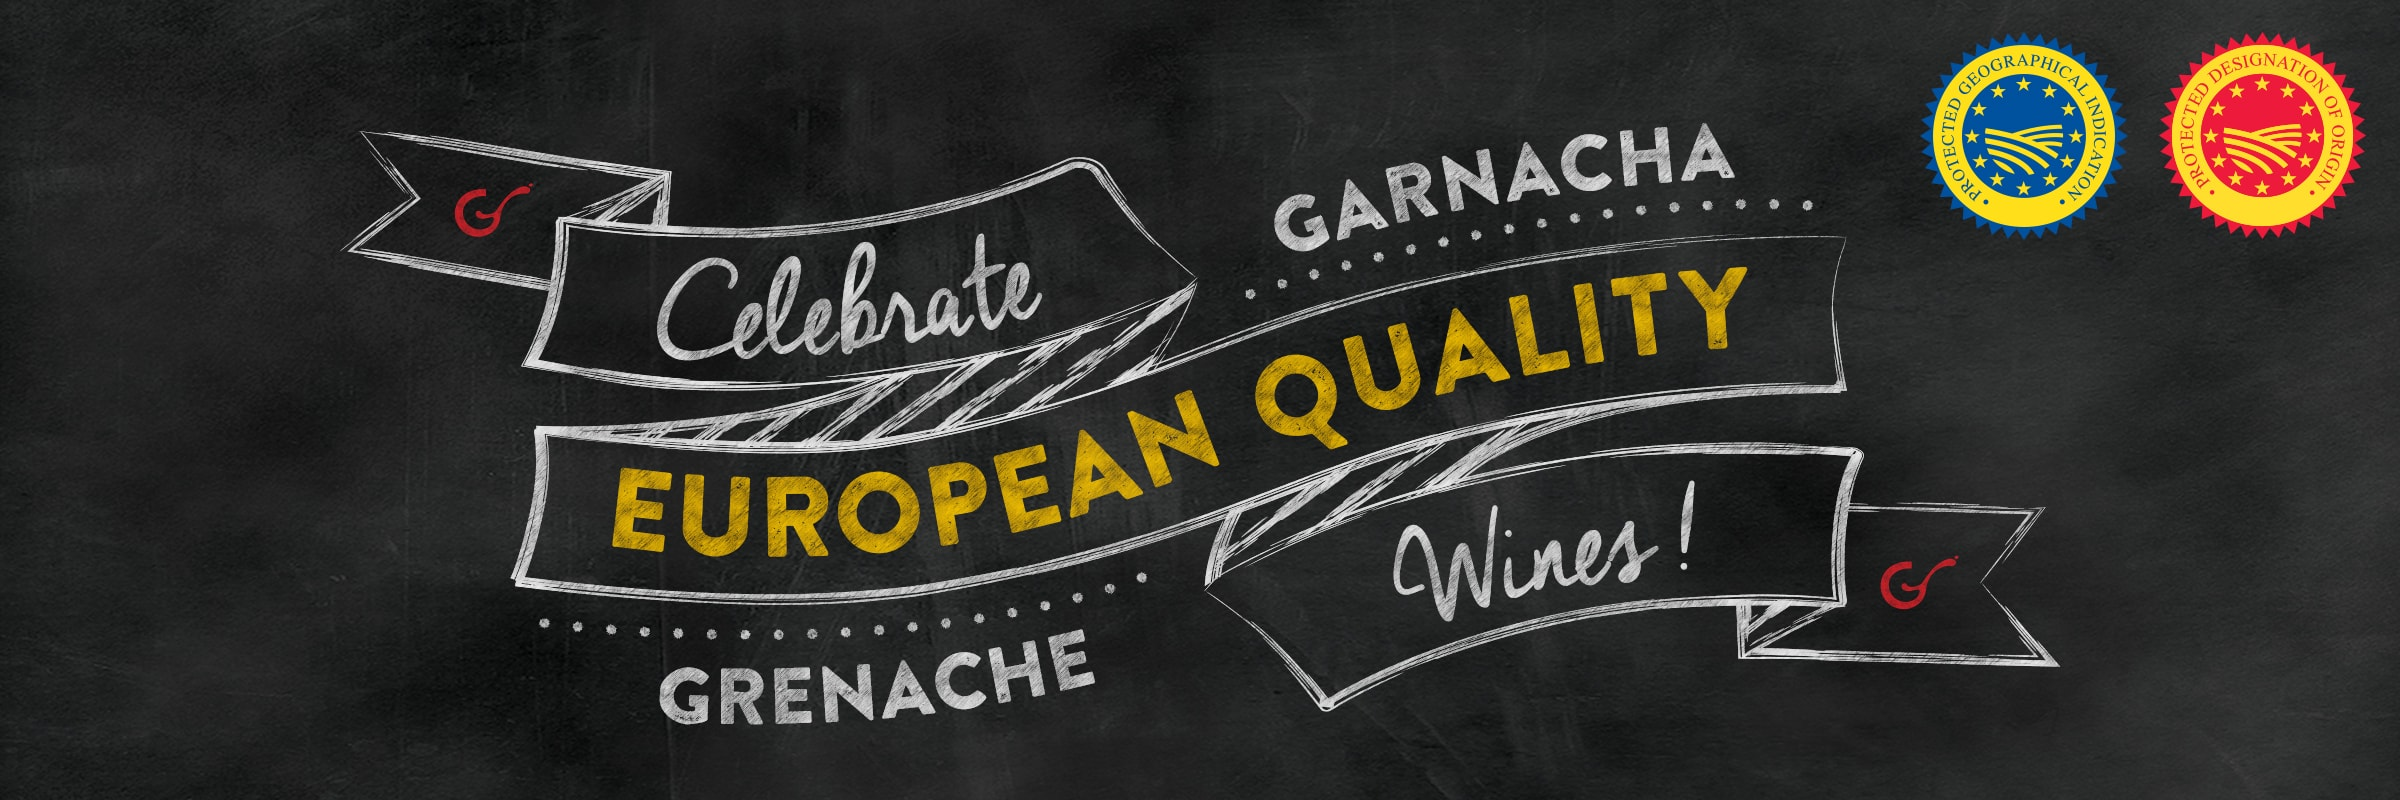 Garnacha Grenache - European Quality